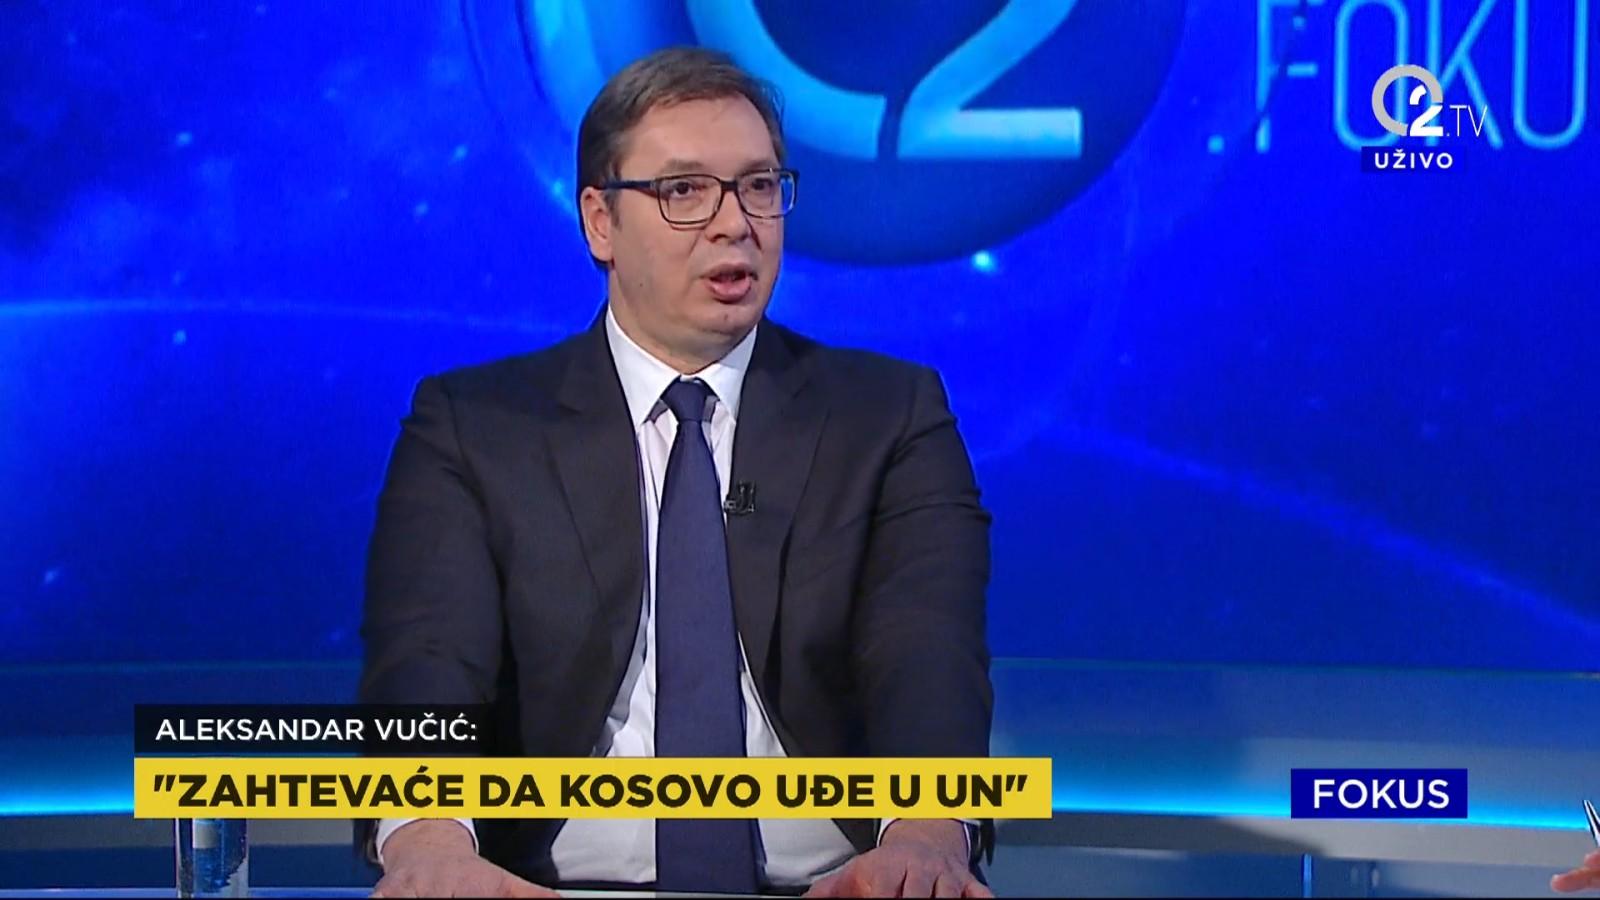 Predsednik Aleksandar Vucic o zahtevima da tzv. Kosovo udje u UN.